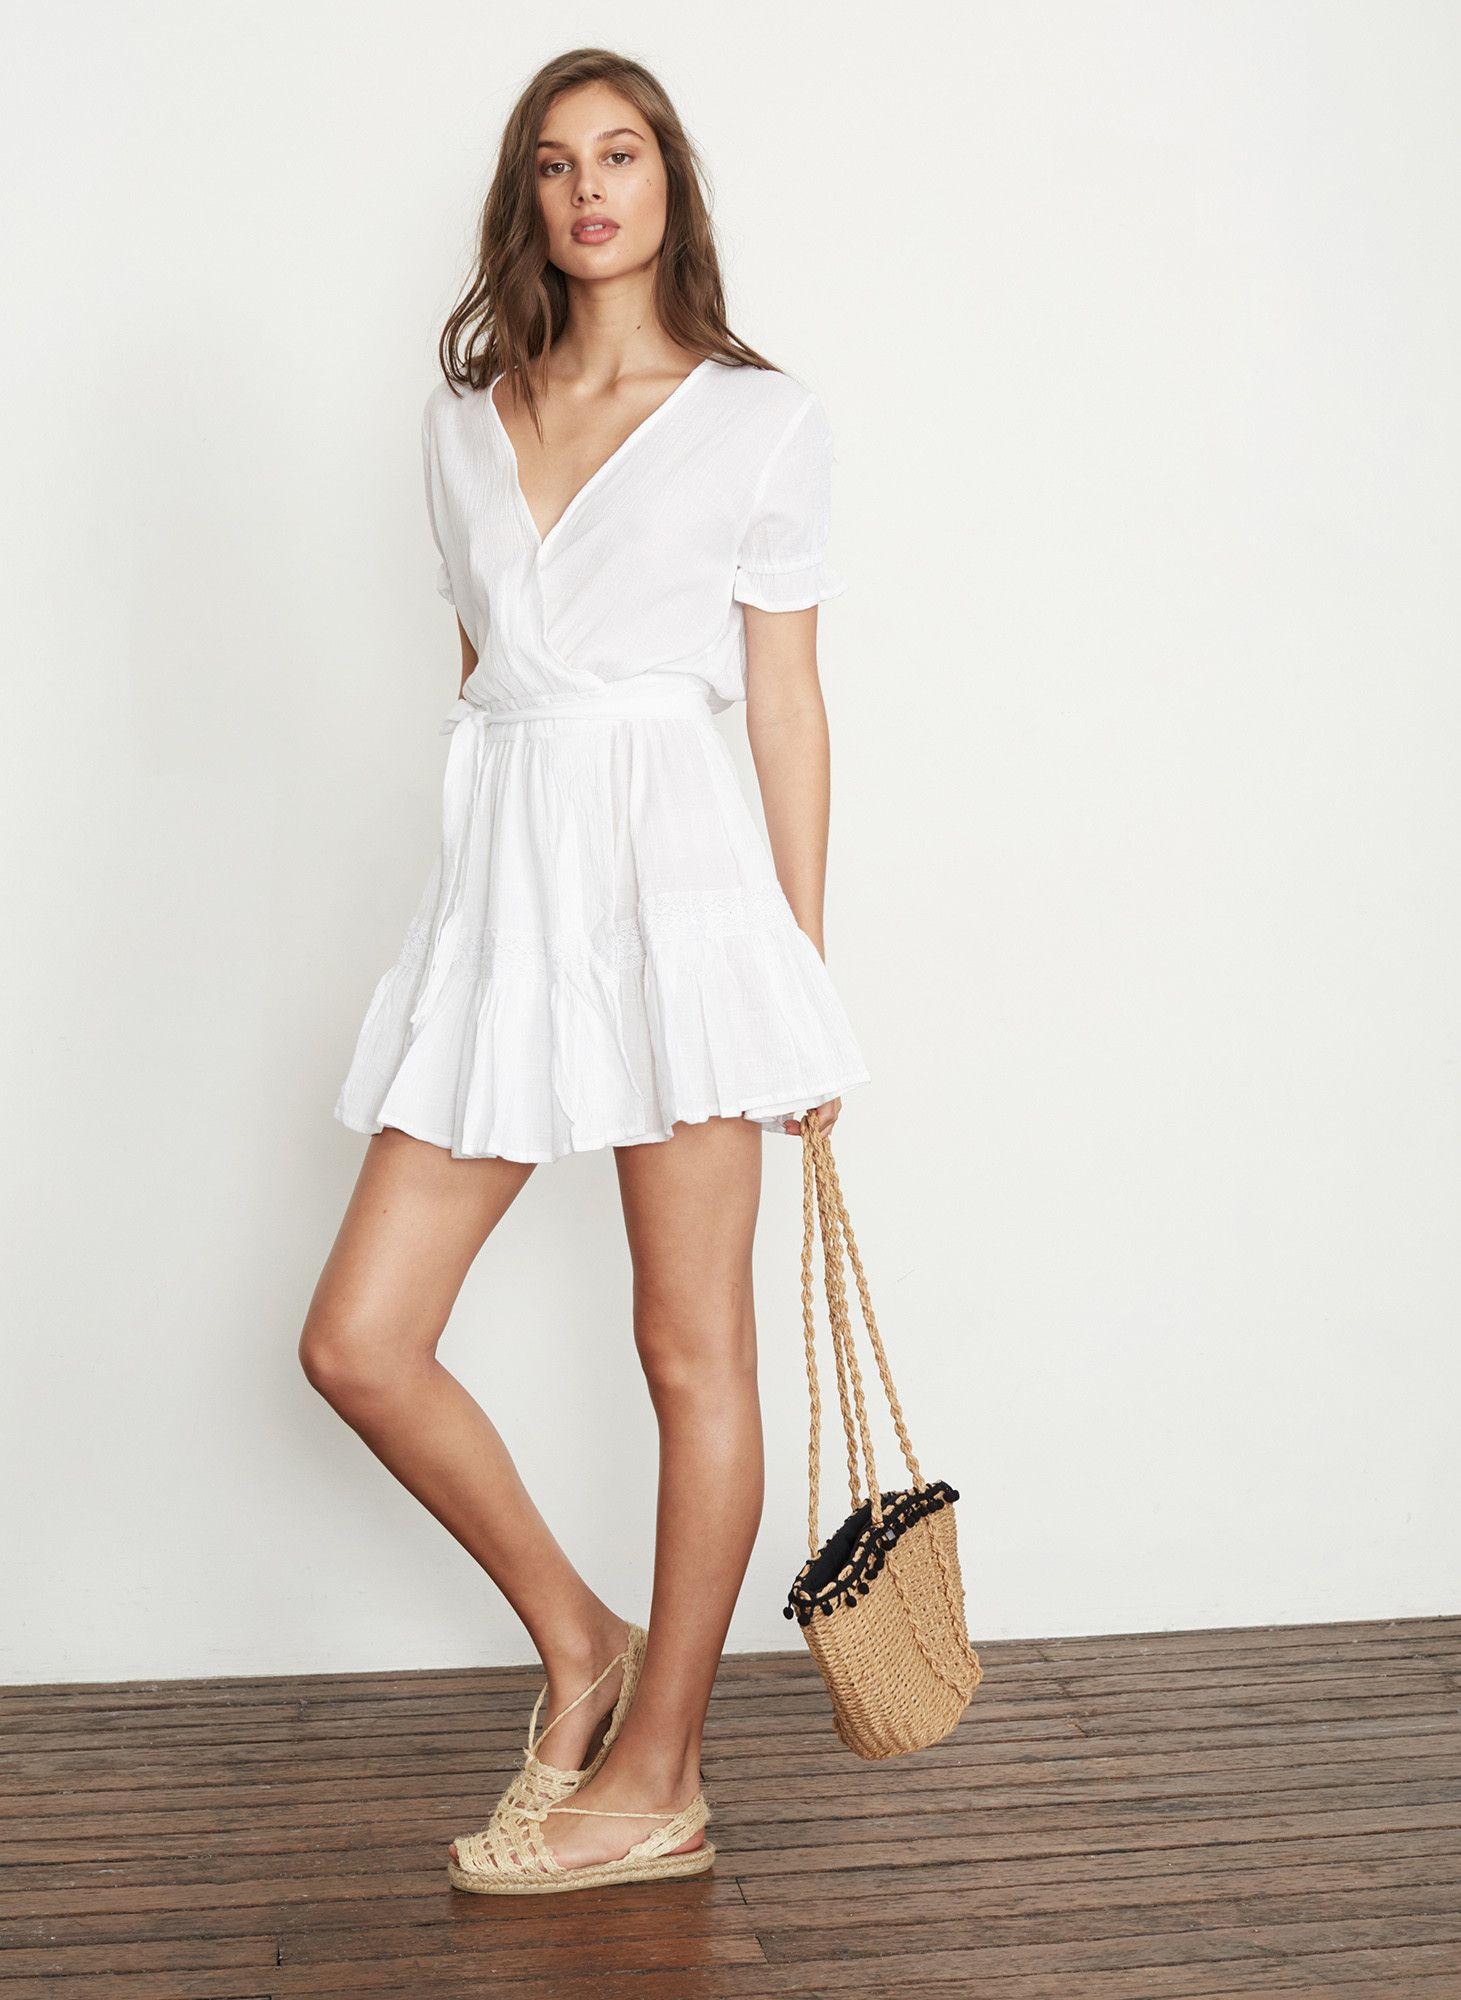 Plain White Liza Dress Faithfull The Brand International Dresses Dress Up Evening Dresses [ 2000 x 1461 Pixel ]